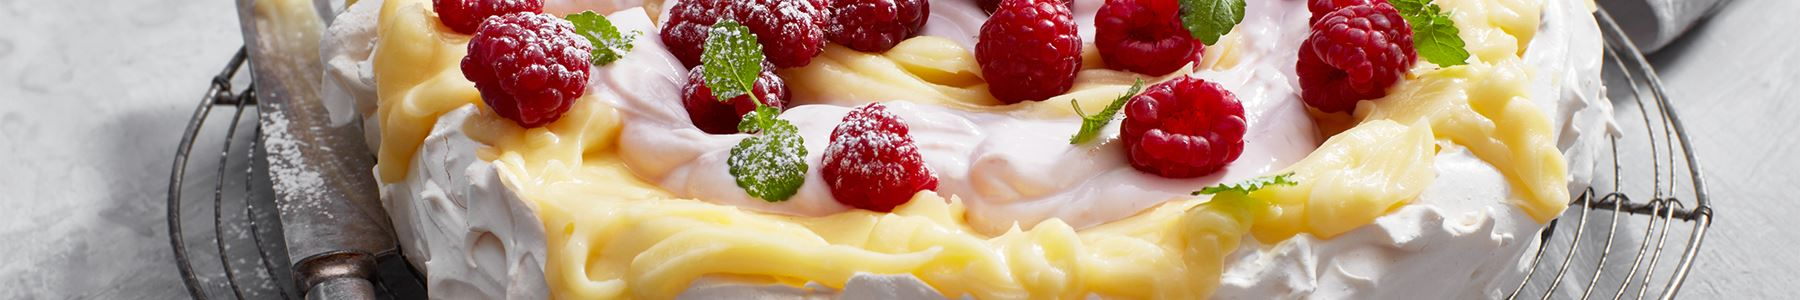 Tårta till fest